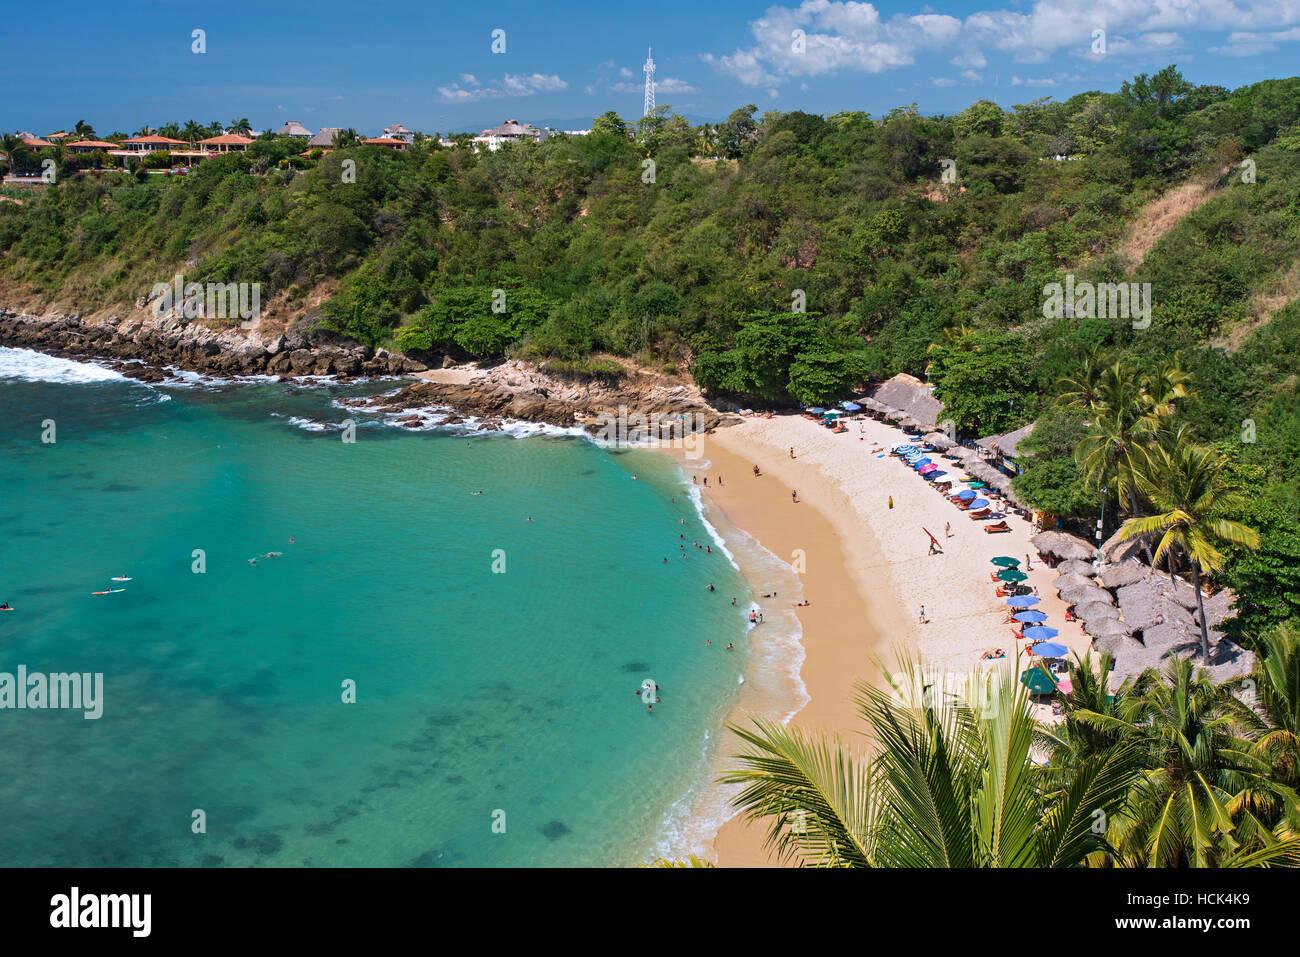 Puerto escondido imgenes de stock puerto escondido fotos de stock playa carrizalillo puerto escondido mxico imagen de stock thecheapjerseys Gallery